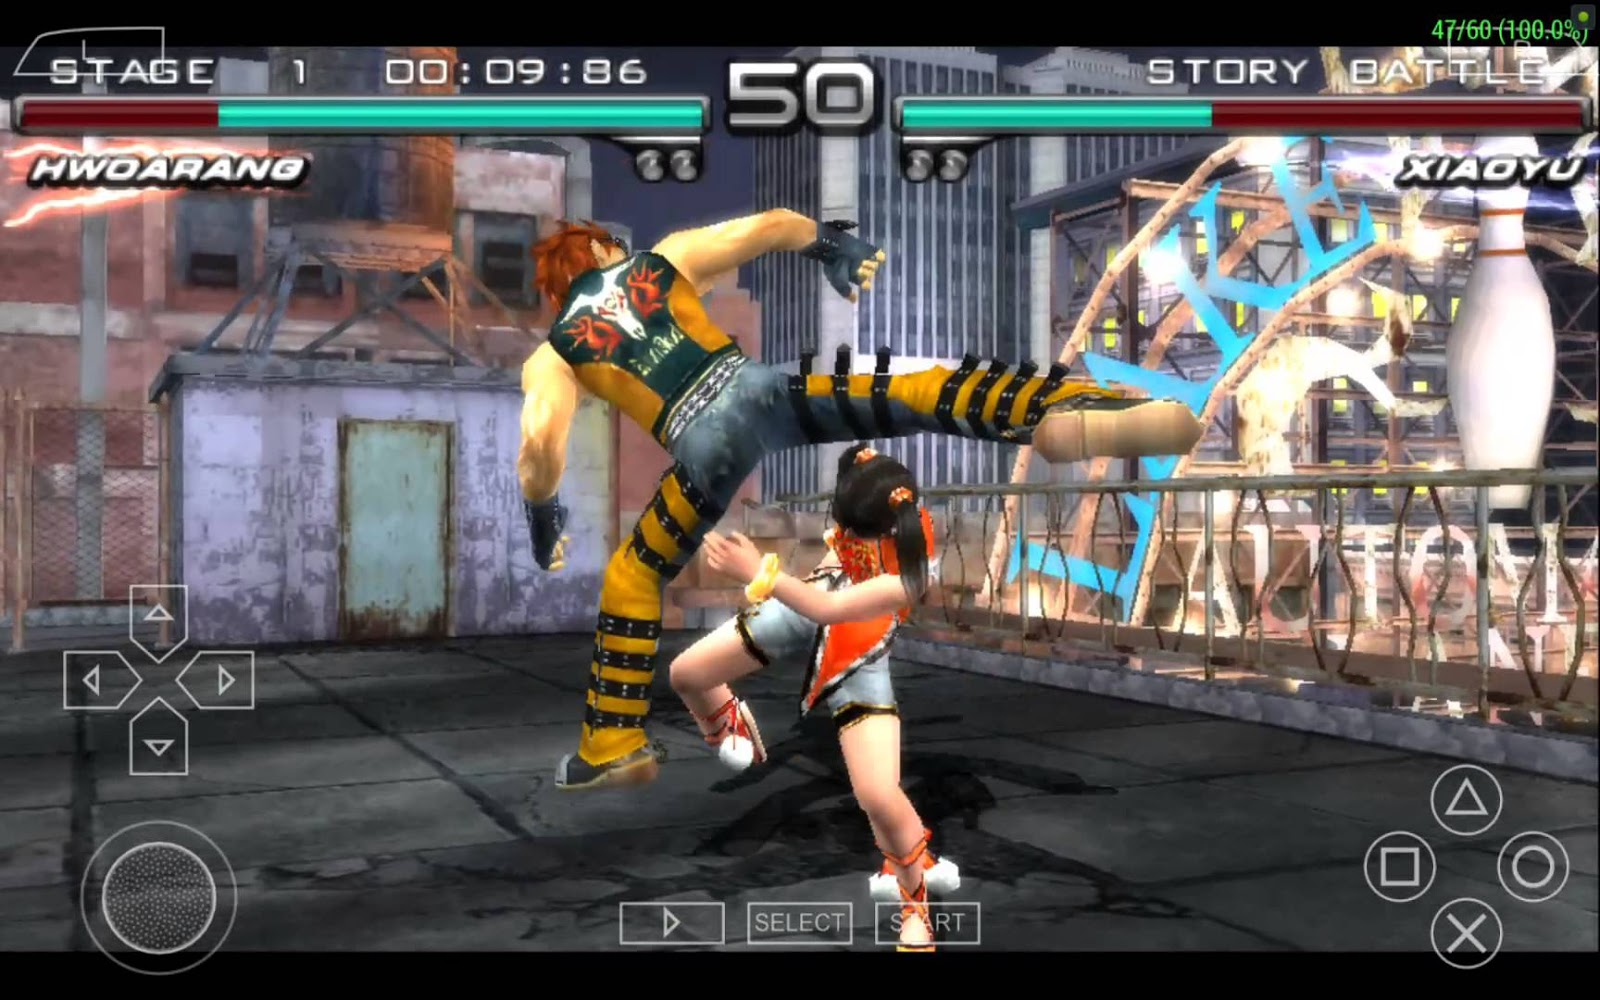 Play Tekken Advance on GBA - Emulator Online